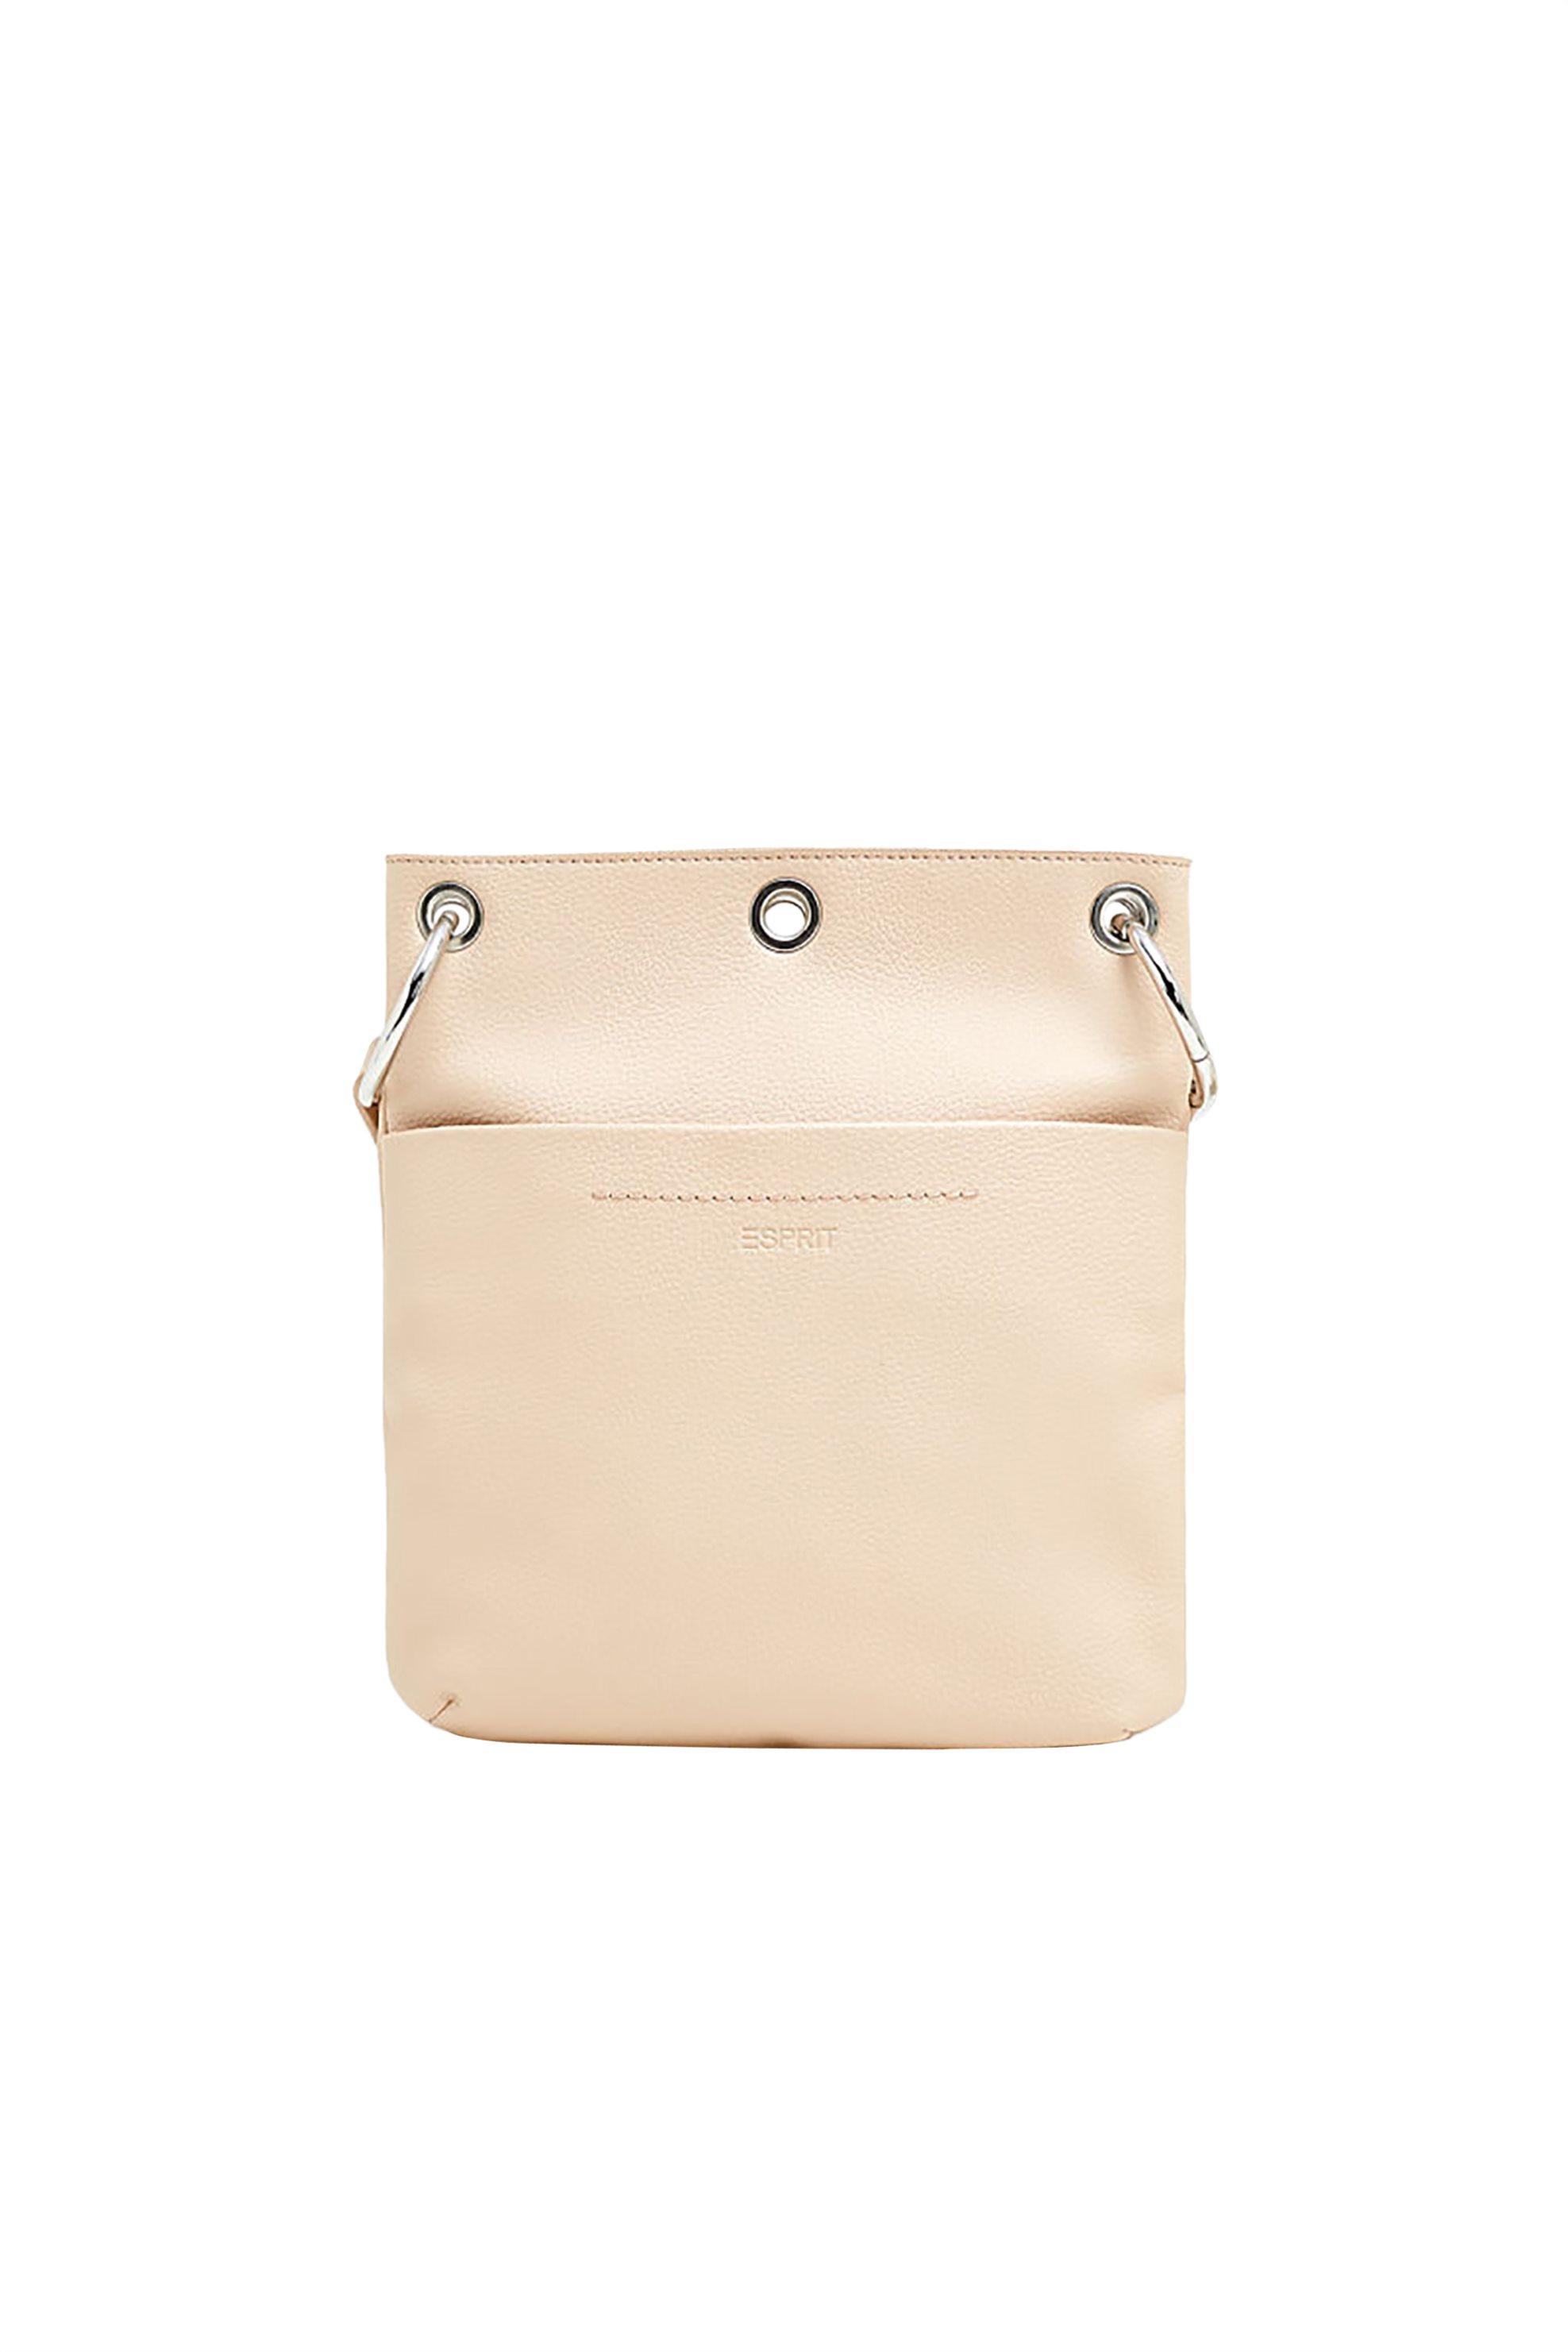 7b59c54613 ESPRIT - Κορυφαία προϊόντα για Γυναικείες Τσάντες